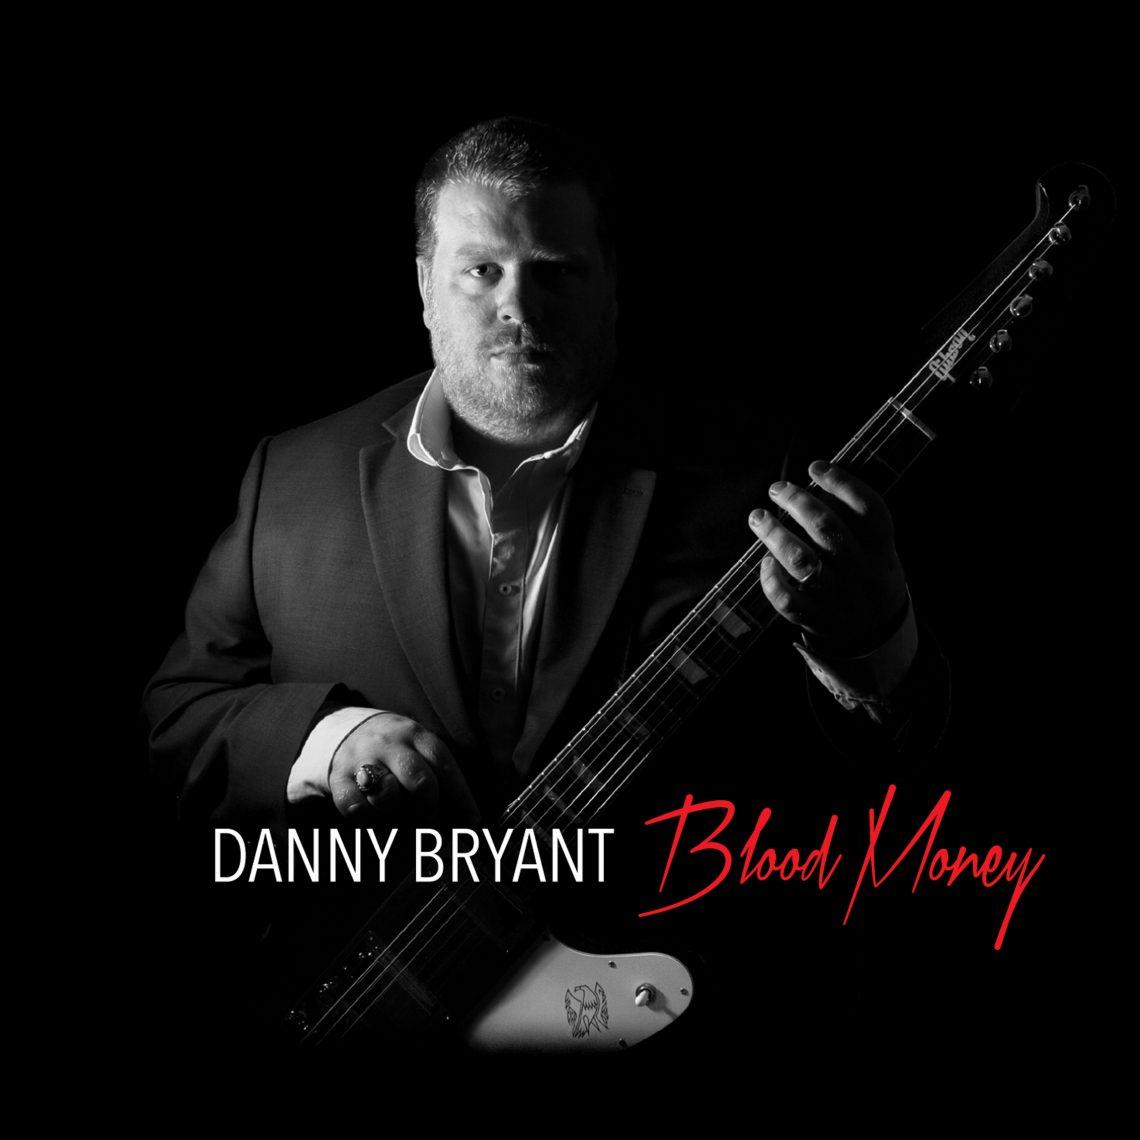 DANNY BRYANT – BLOOD MONEY – CD REVIEW & 2016 Tour Dates